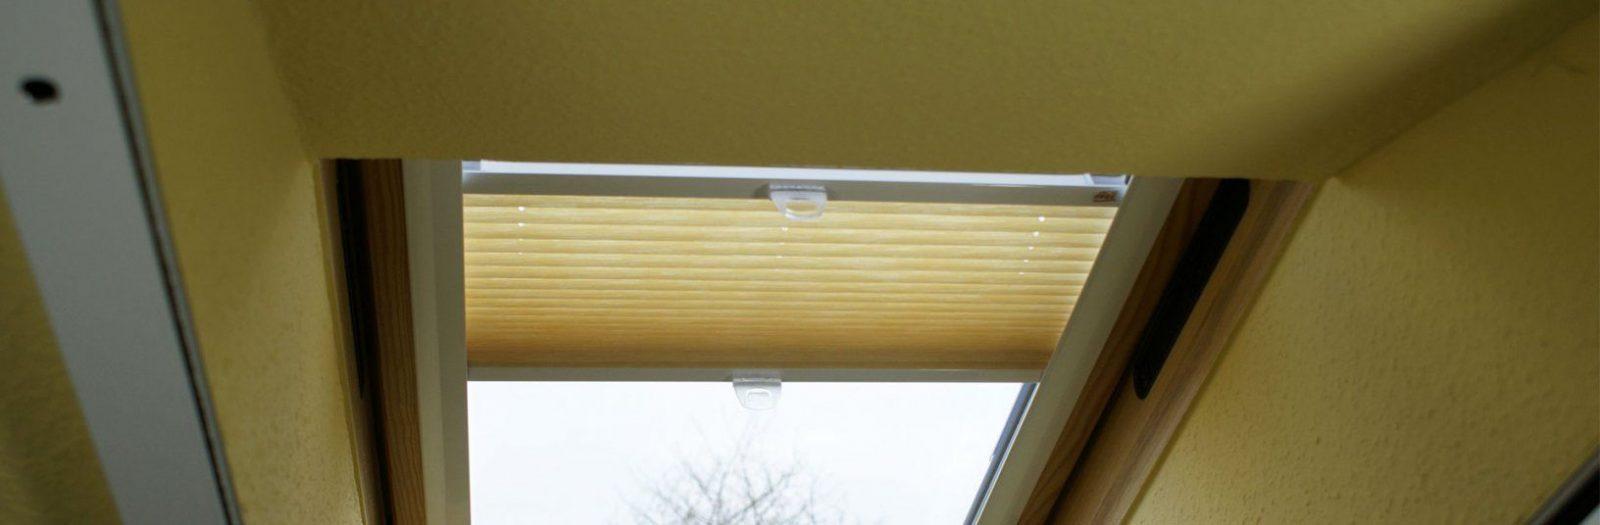 Roto Dachfenster Plissee Ohne Bohren Awesome Rollos Fur Dachfenster von Roto Dachfenster Plissee Ohne Bohren Photo